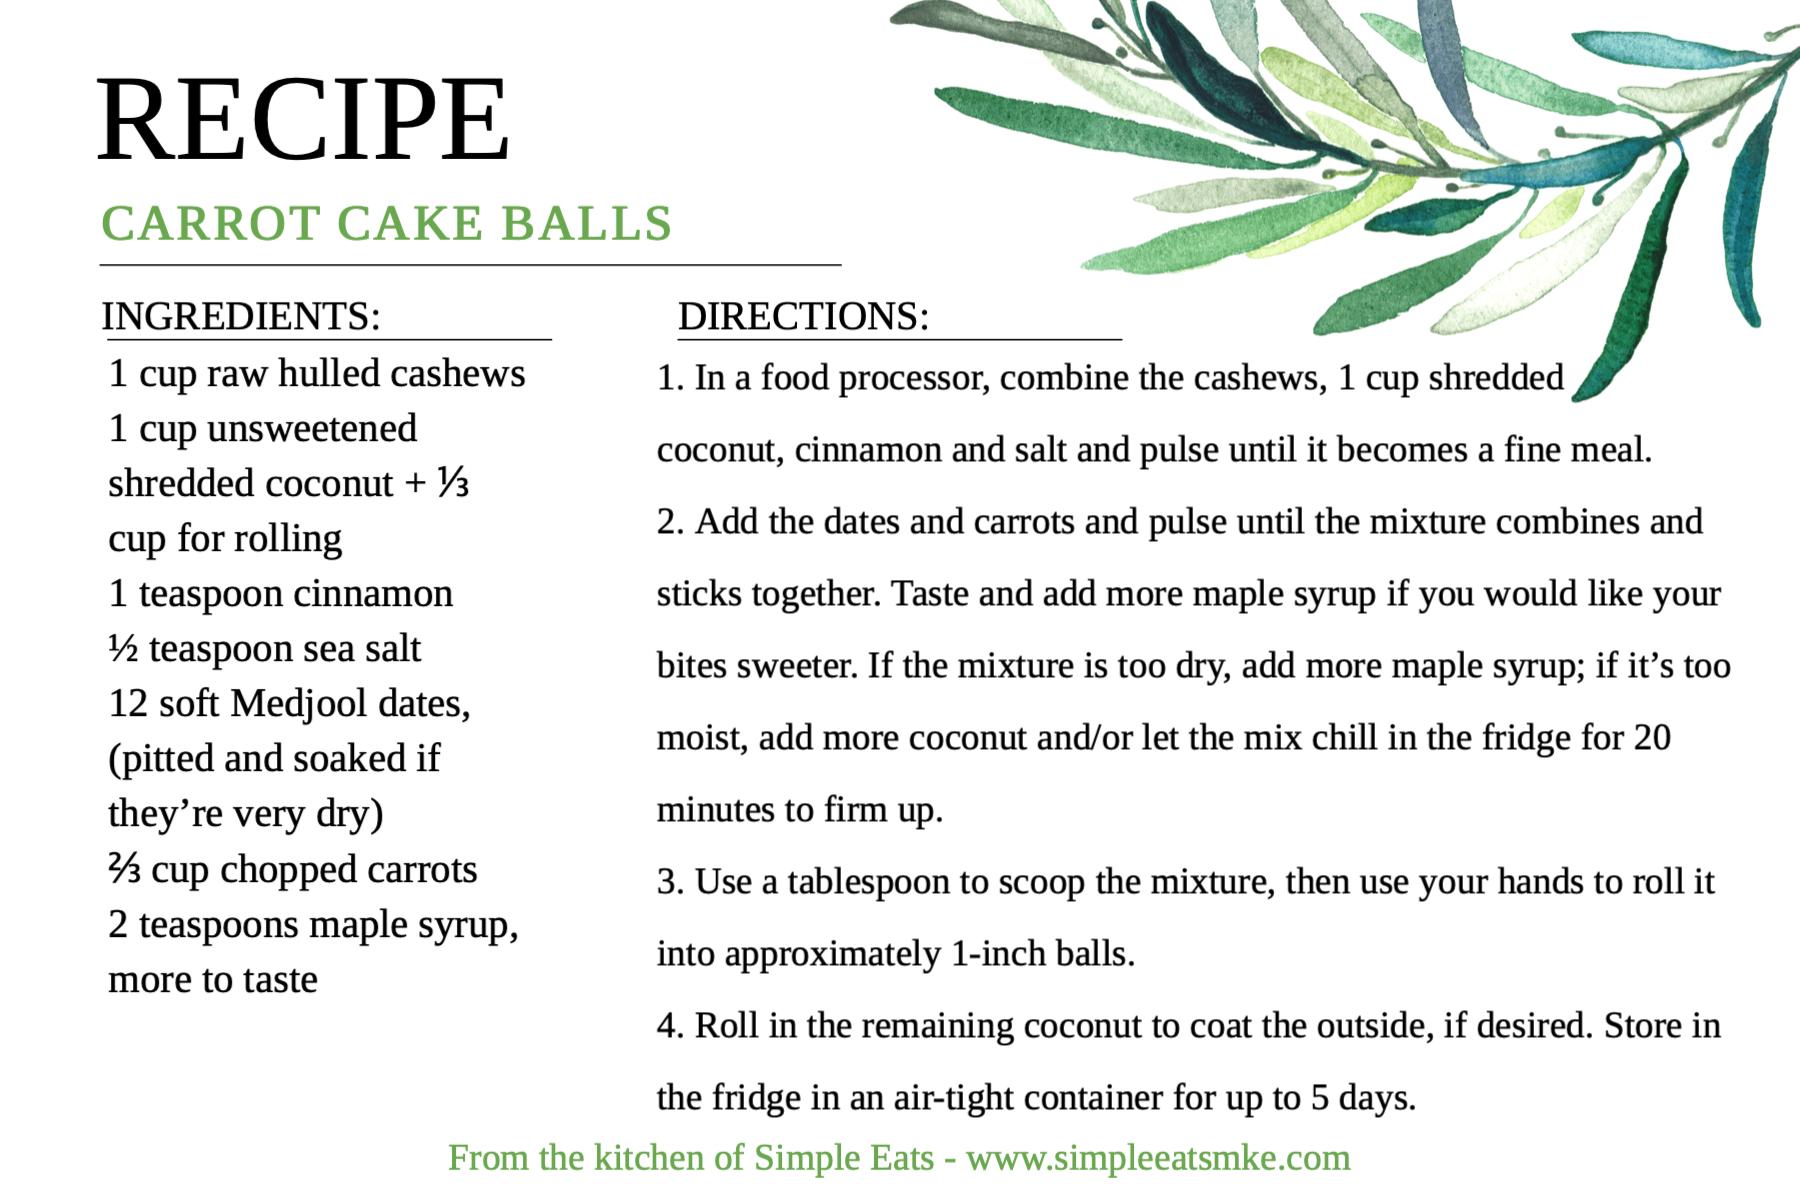 11_17 Carrot Cake Balls.jpeg